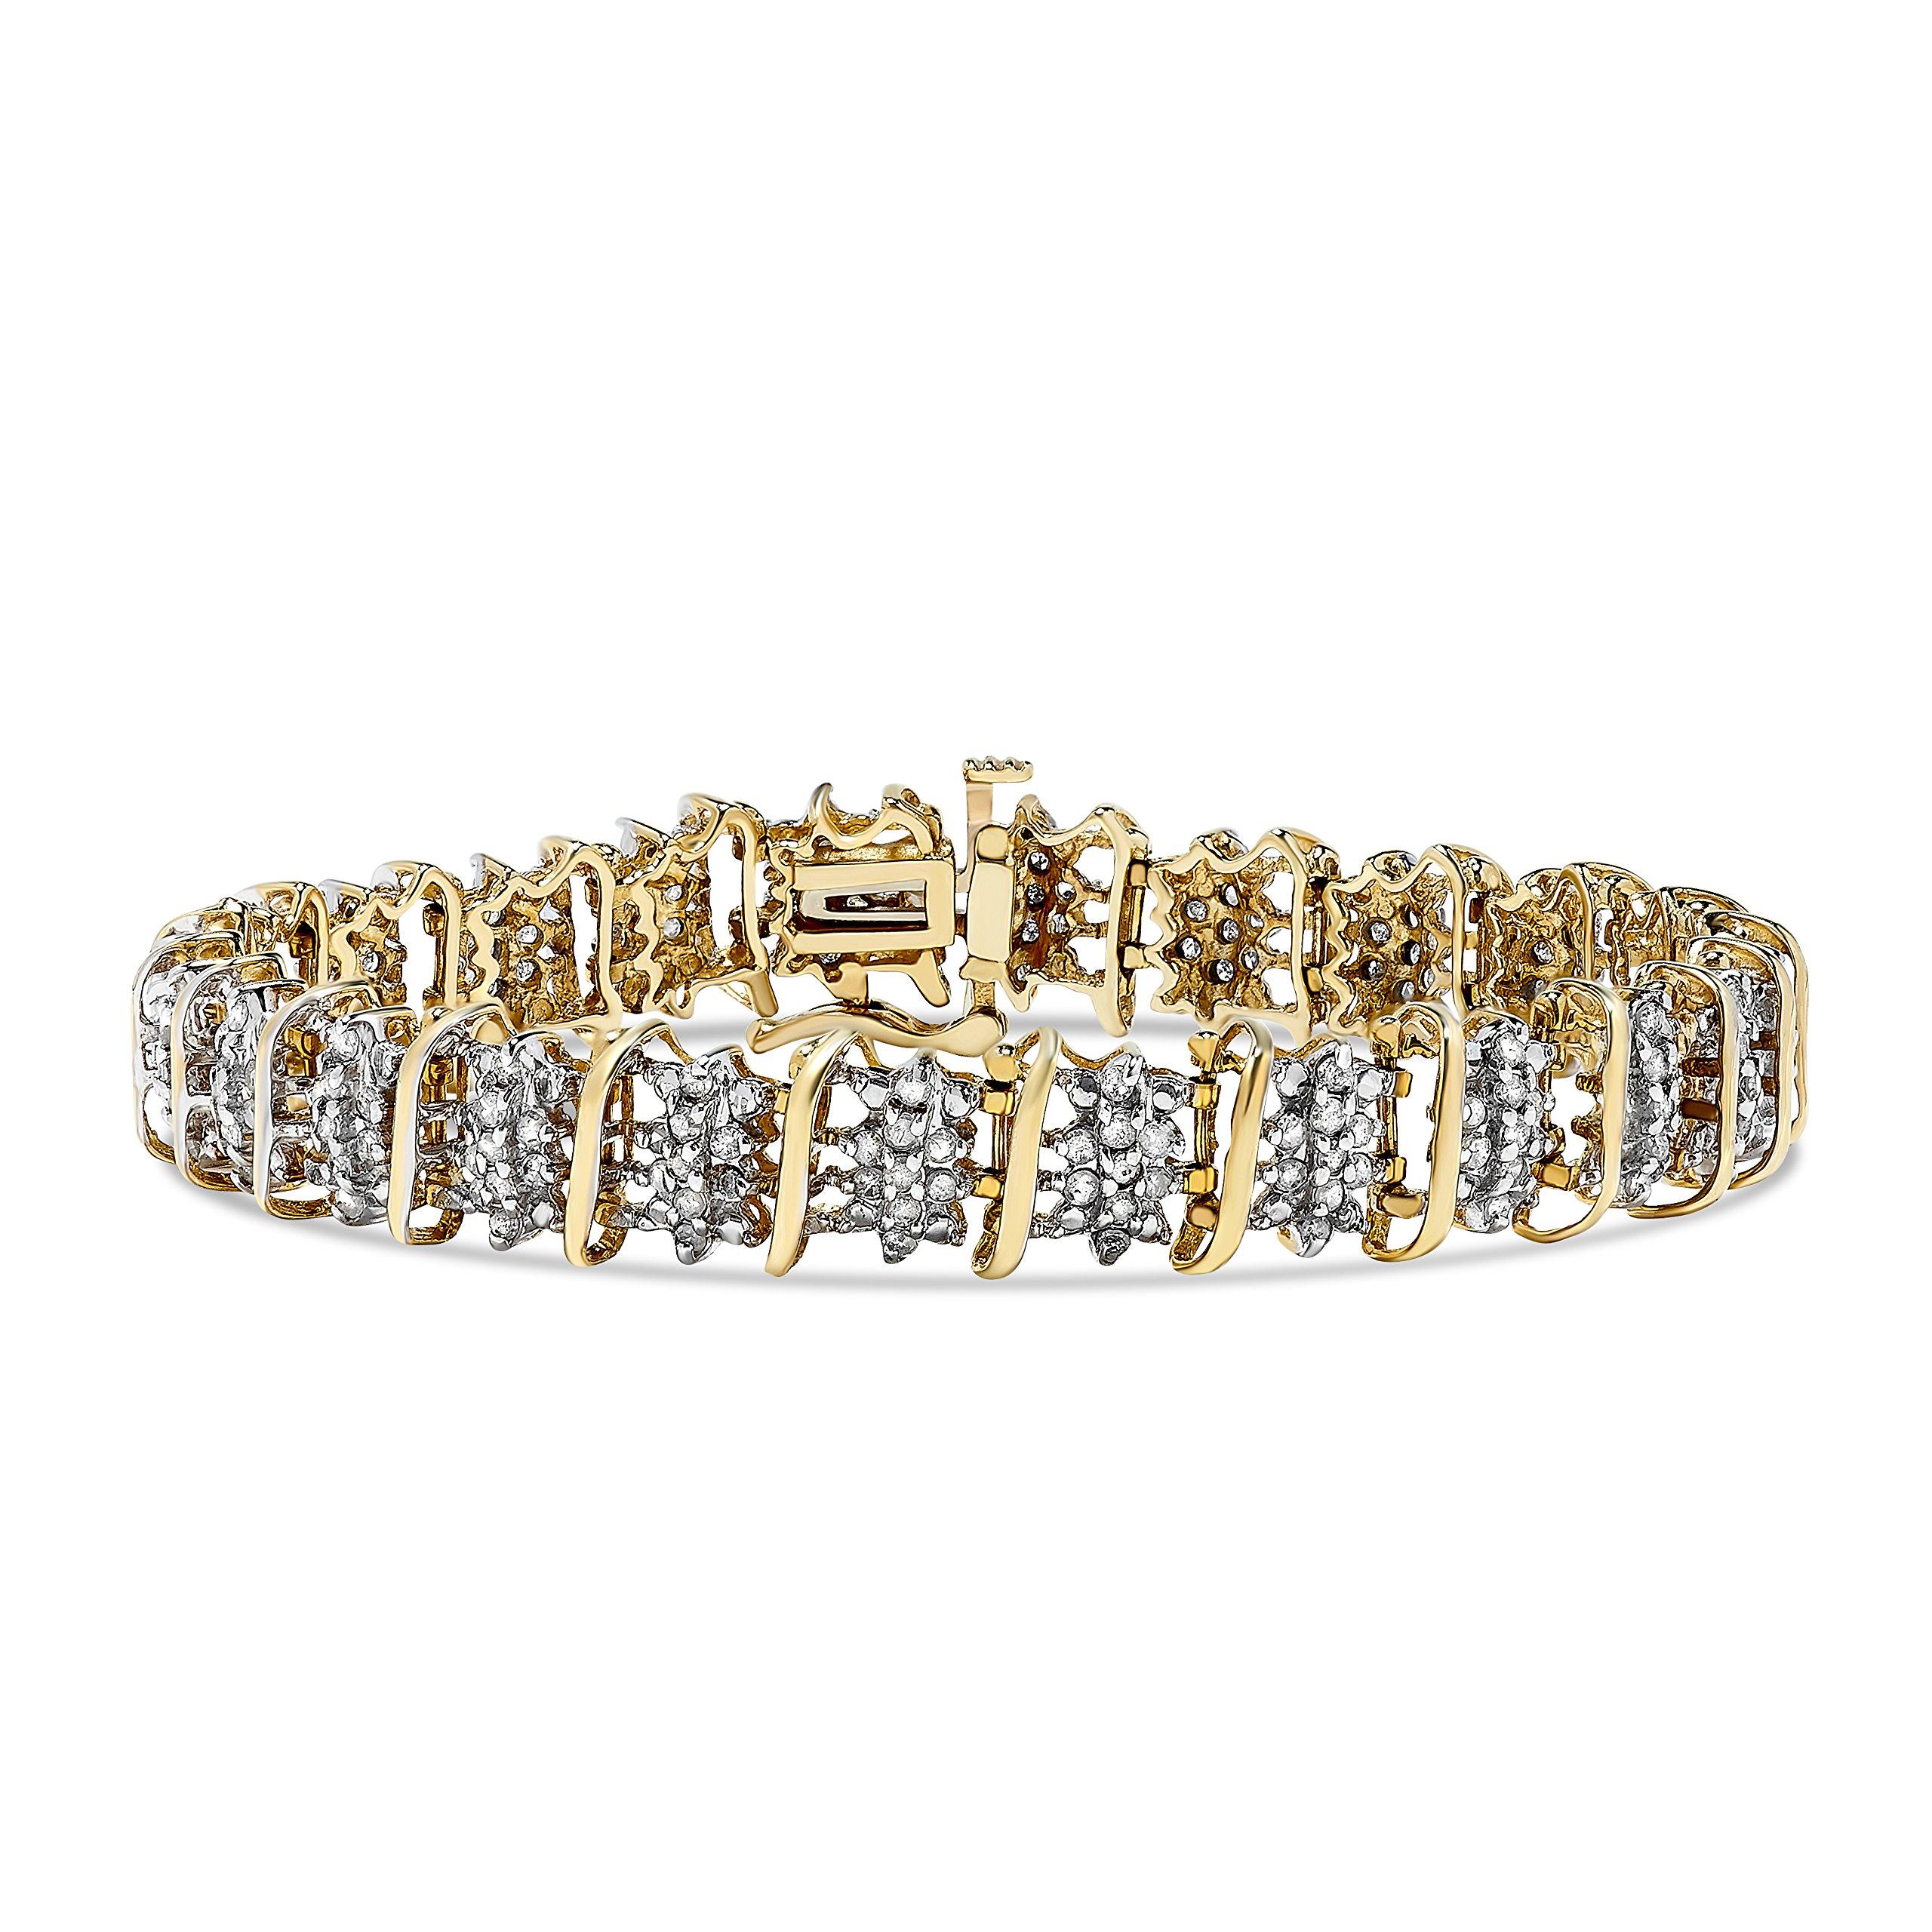 10k 2.00ct Diamond Bracelet in Yellow Gold